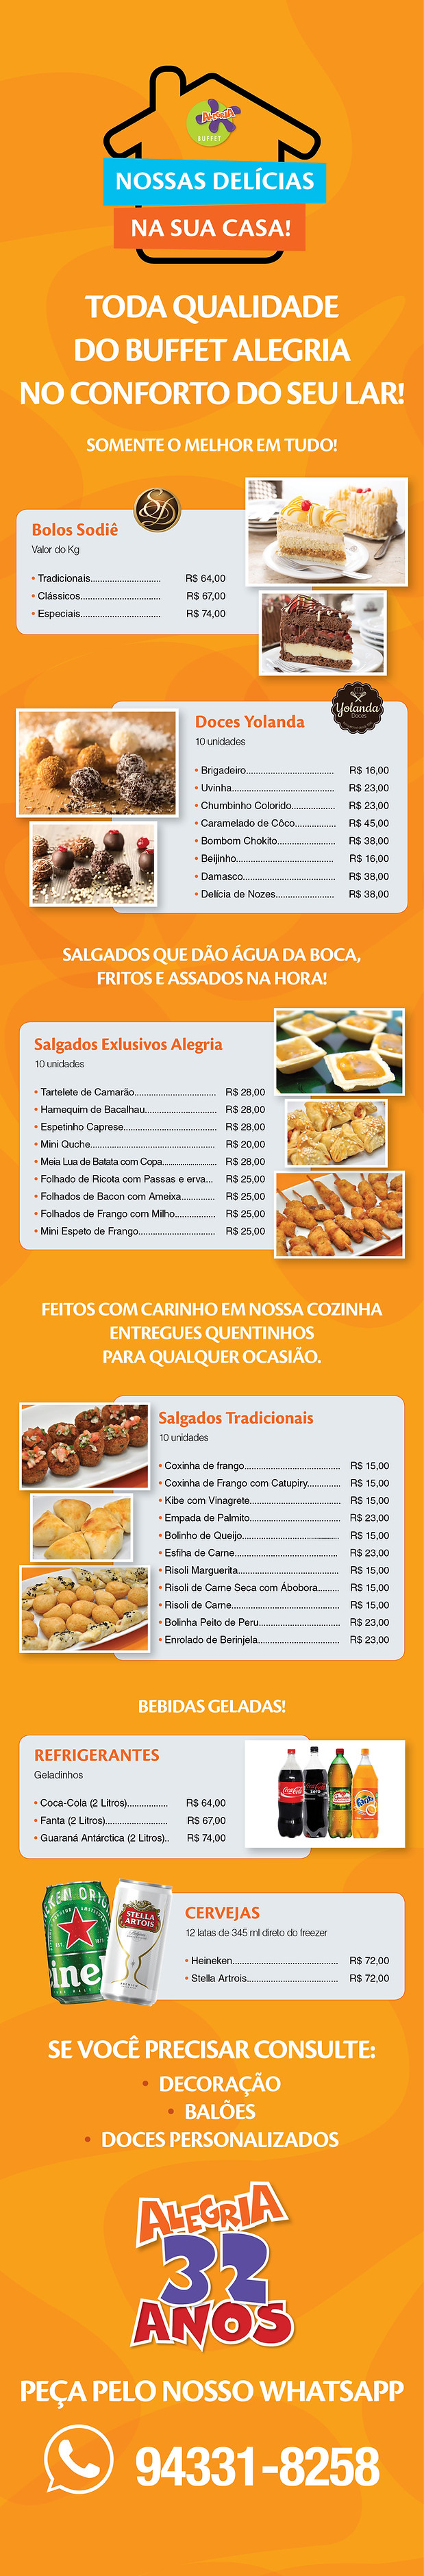 FESTA EM CASA WHATS.jpg